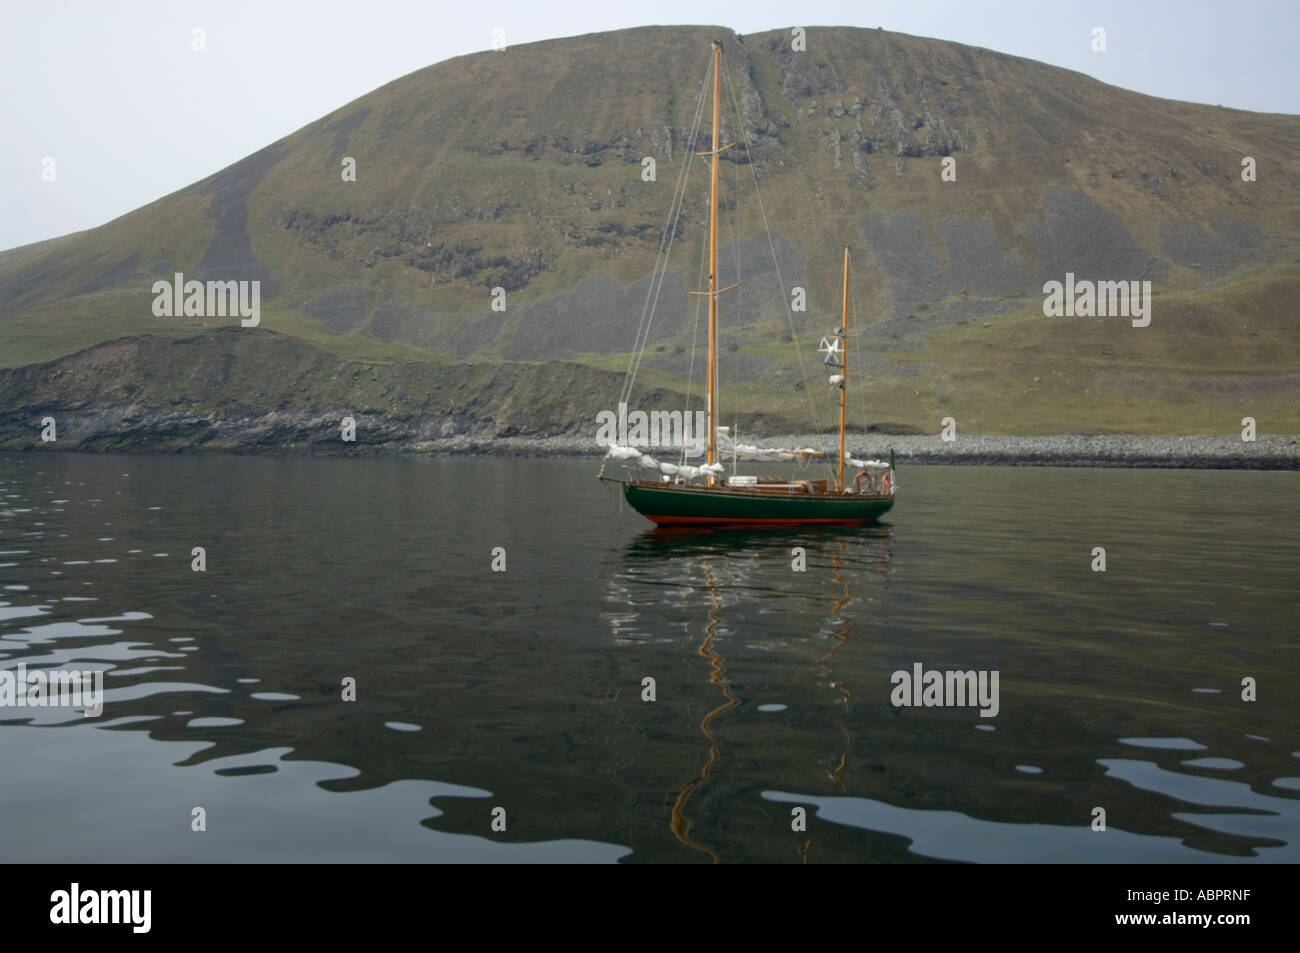 Harbour with the boat, Hirta, St Kilda, Western Isles, Scotland, UK, Europe - Stock Image